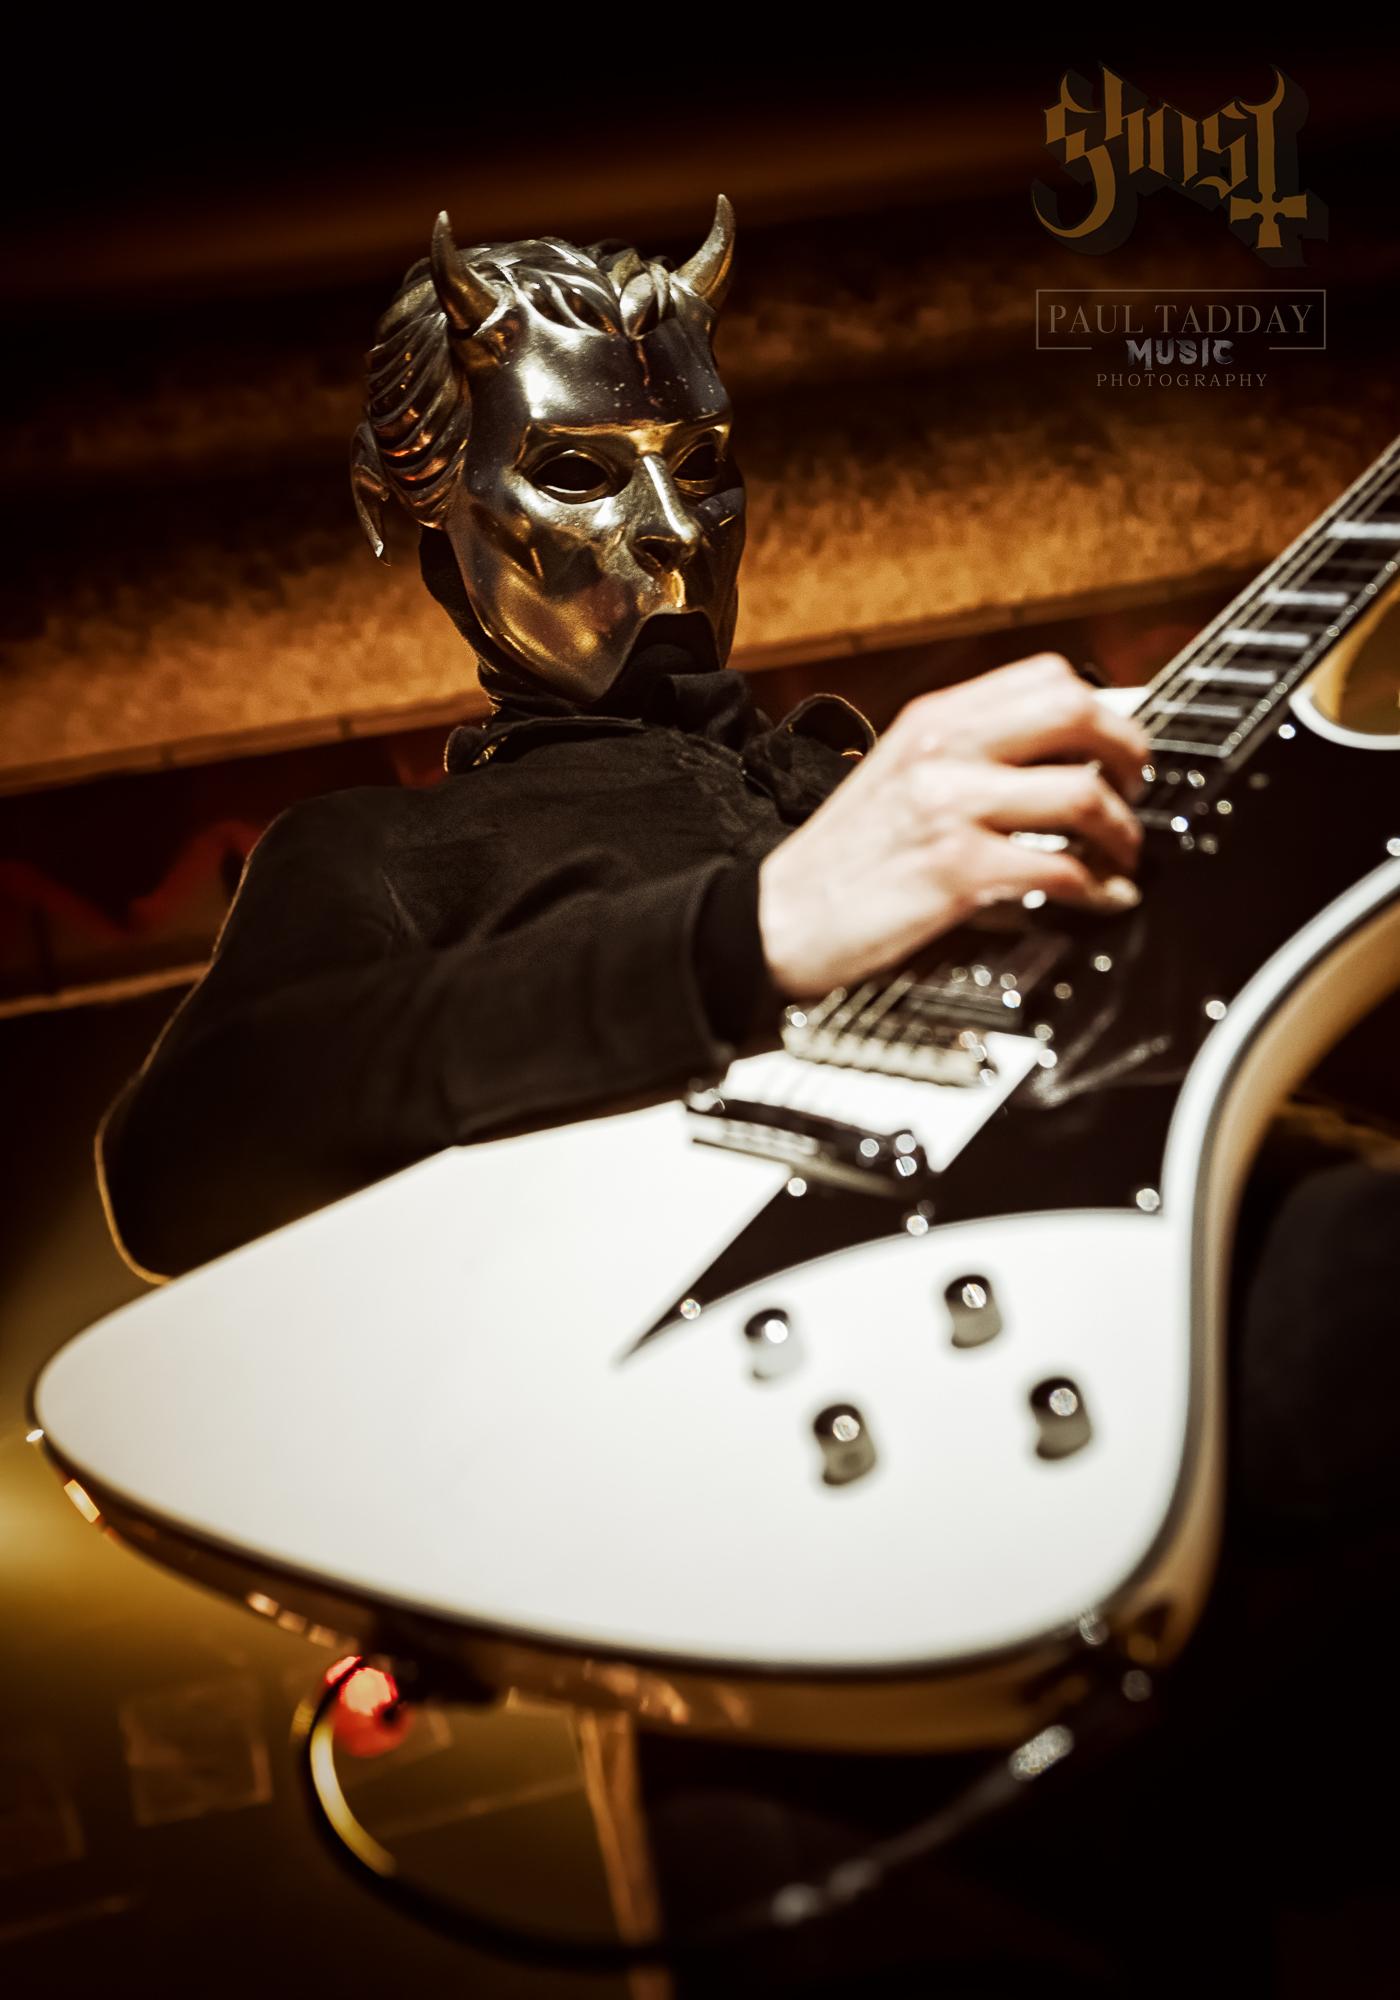 ghost-brisbane-download_2019-paul_tadday-web-23.jpg